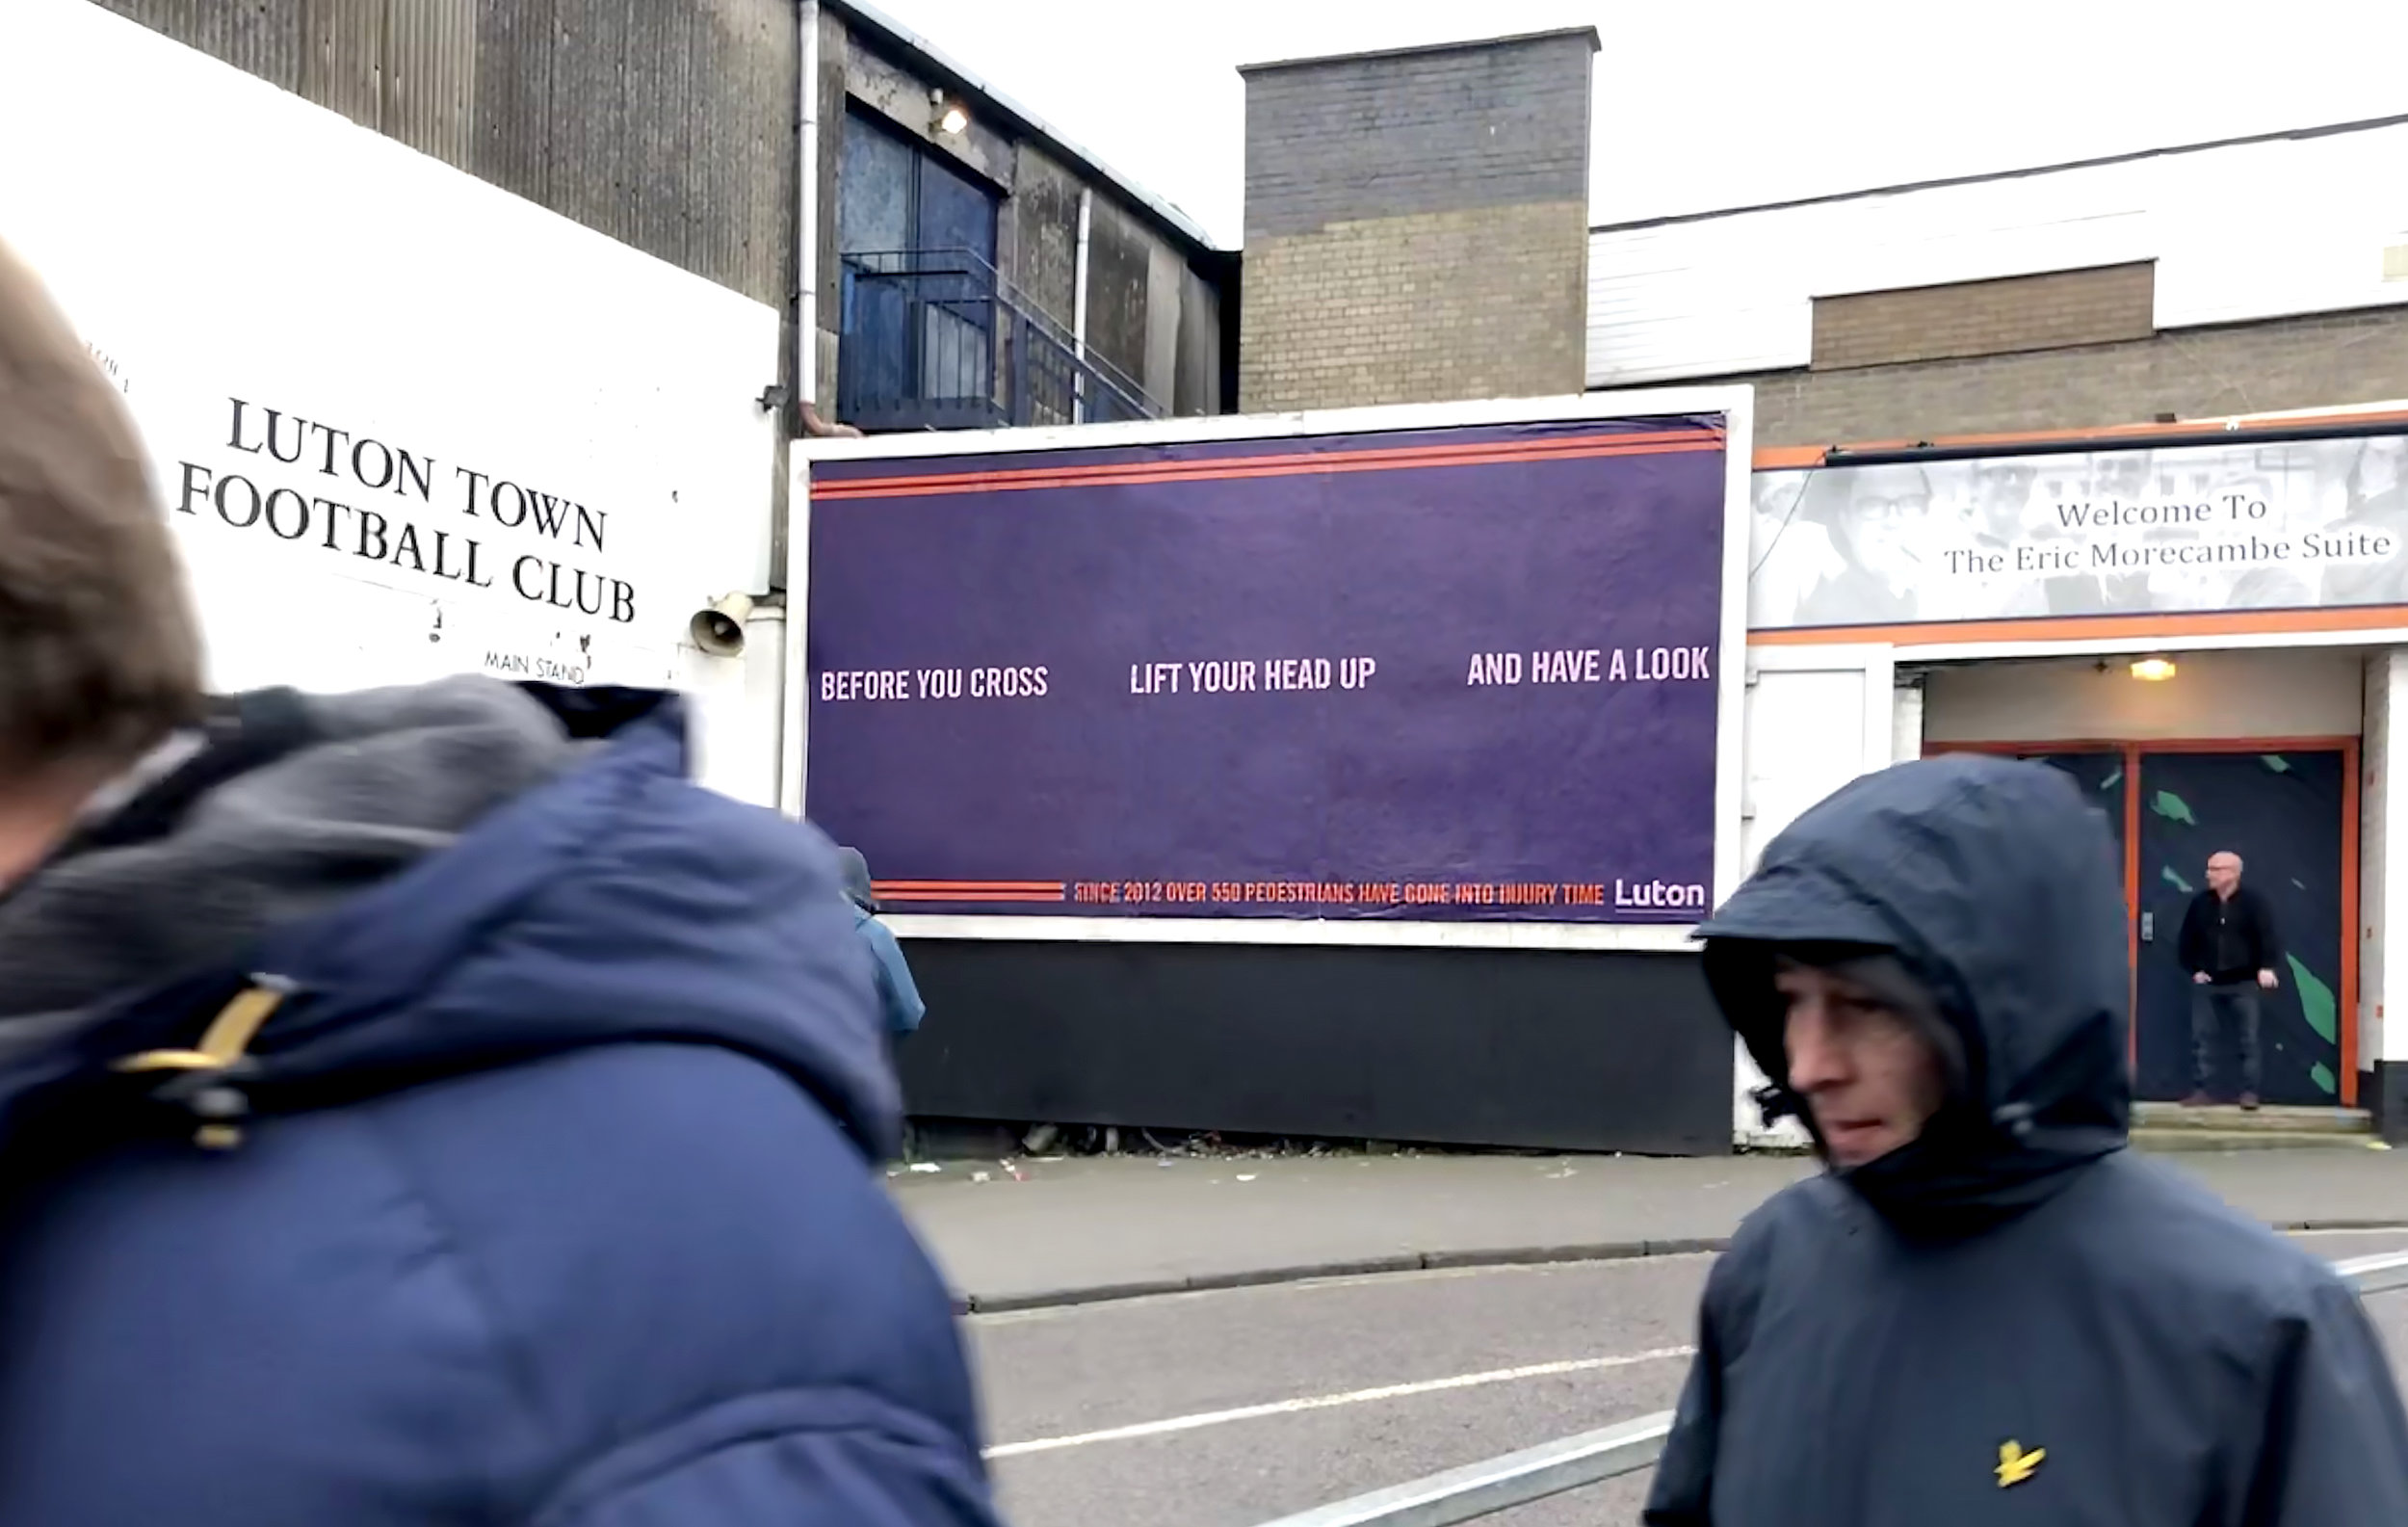 7-poster and pedestrians-crop2.jpg